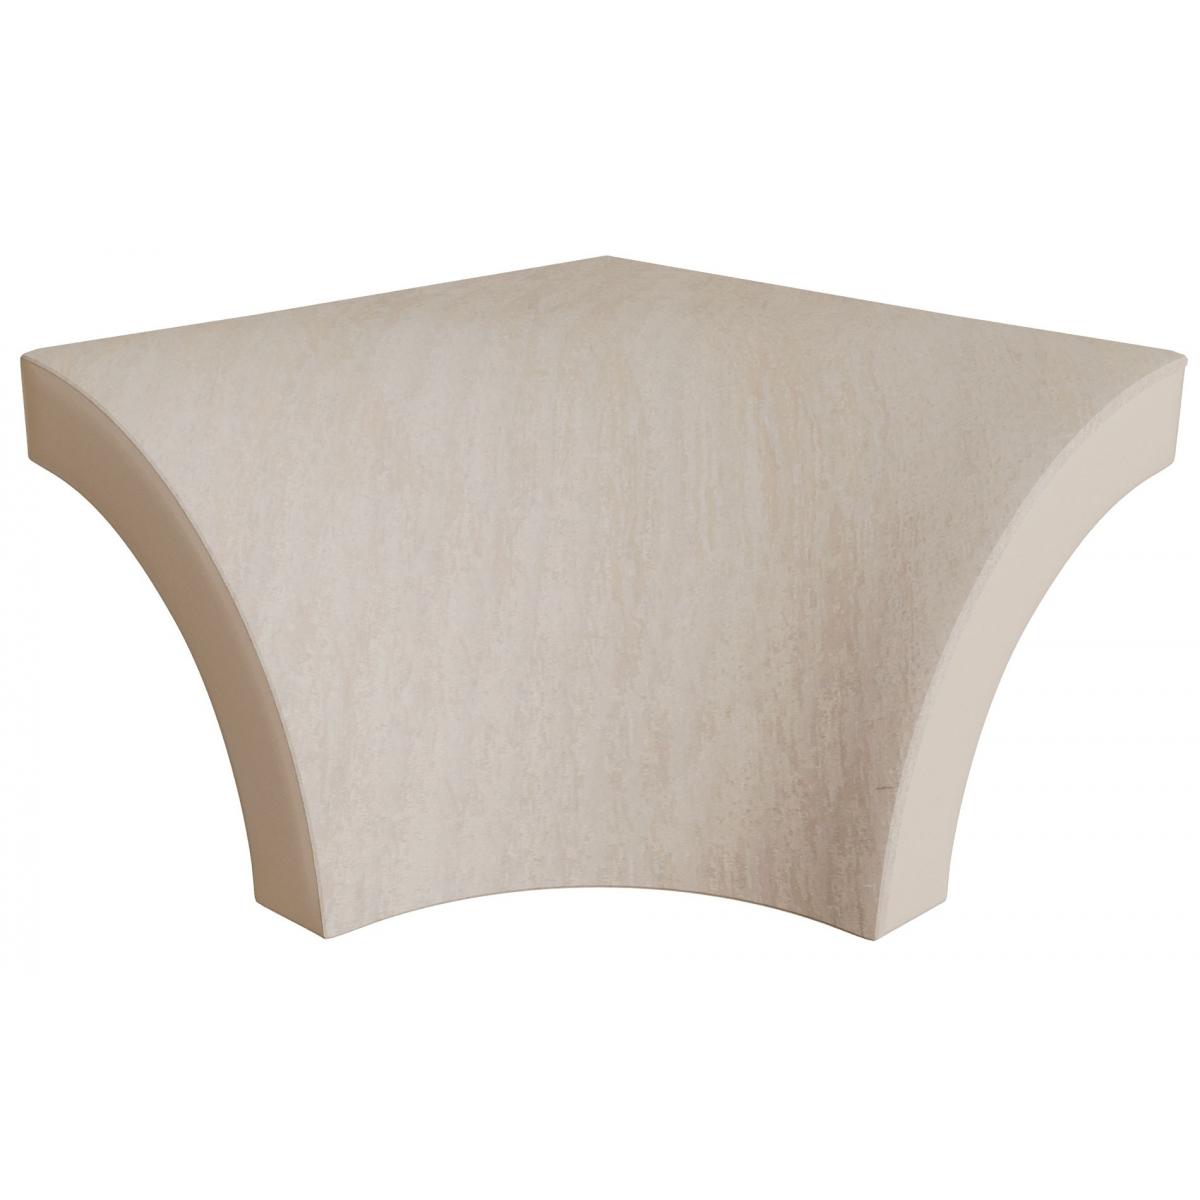 Rinconera exterior Stela White 4x4